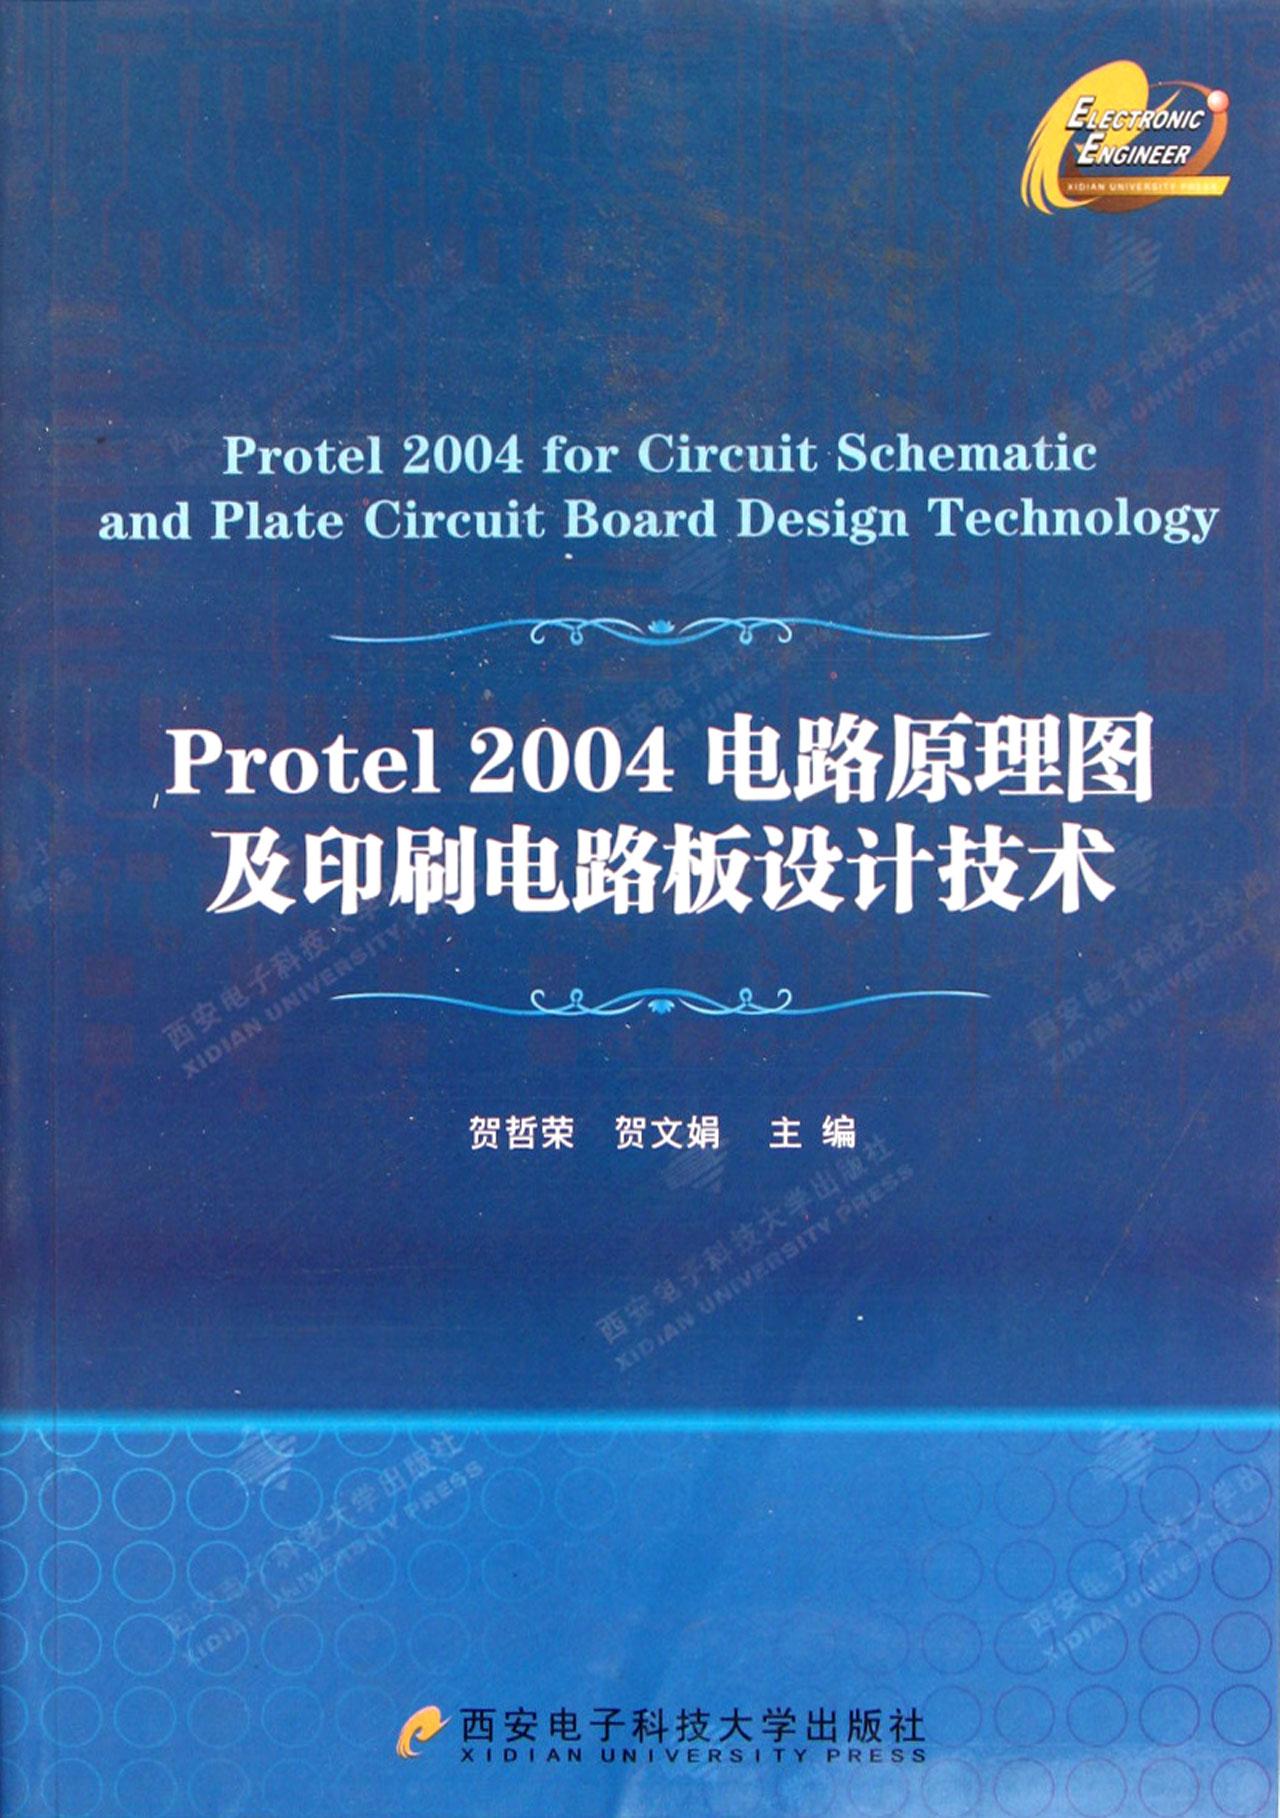 protel2004电路原理图及印刷电路板设计技术